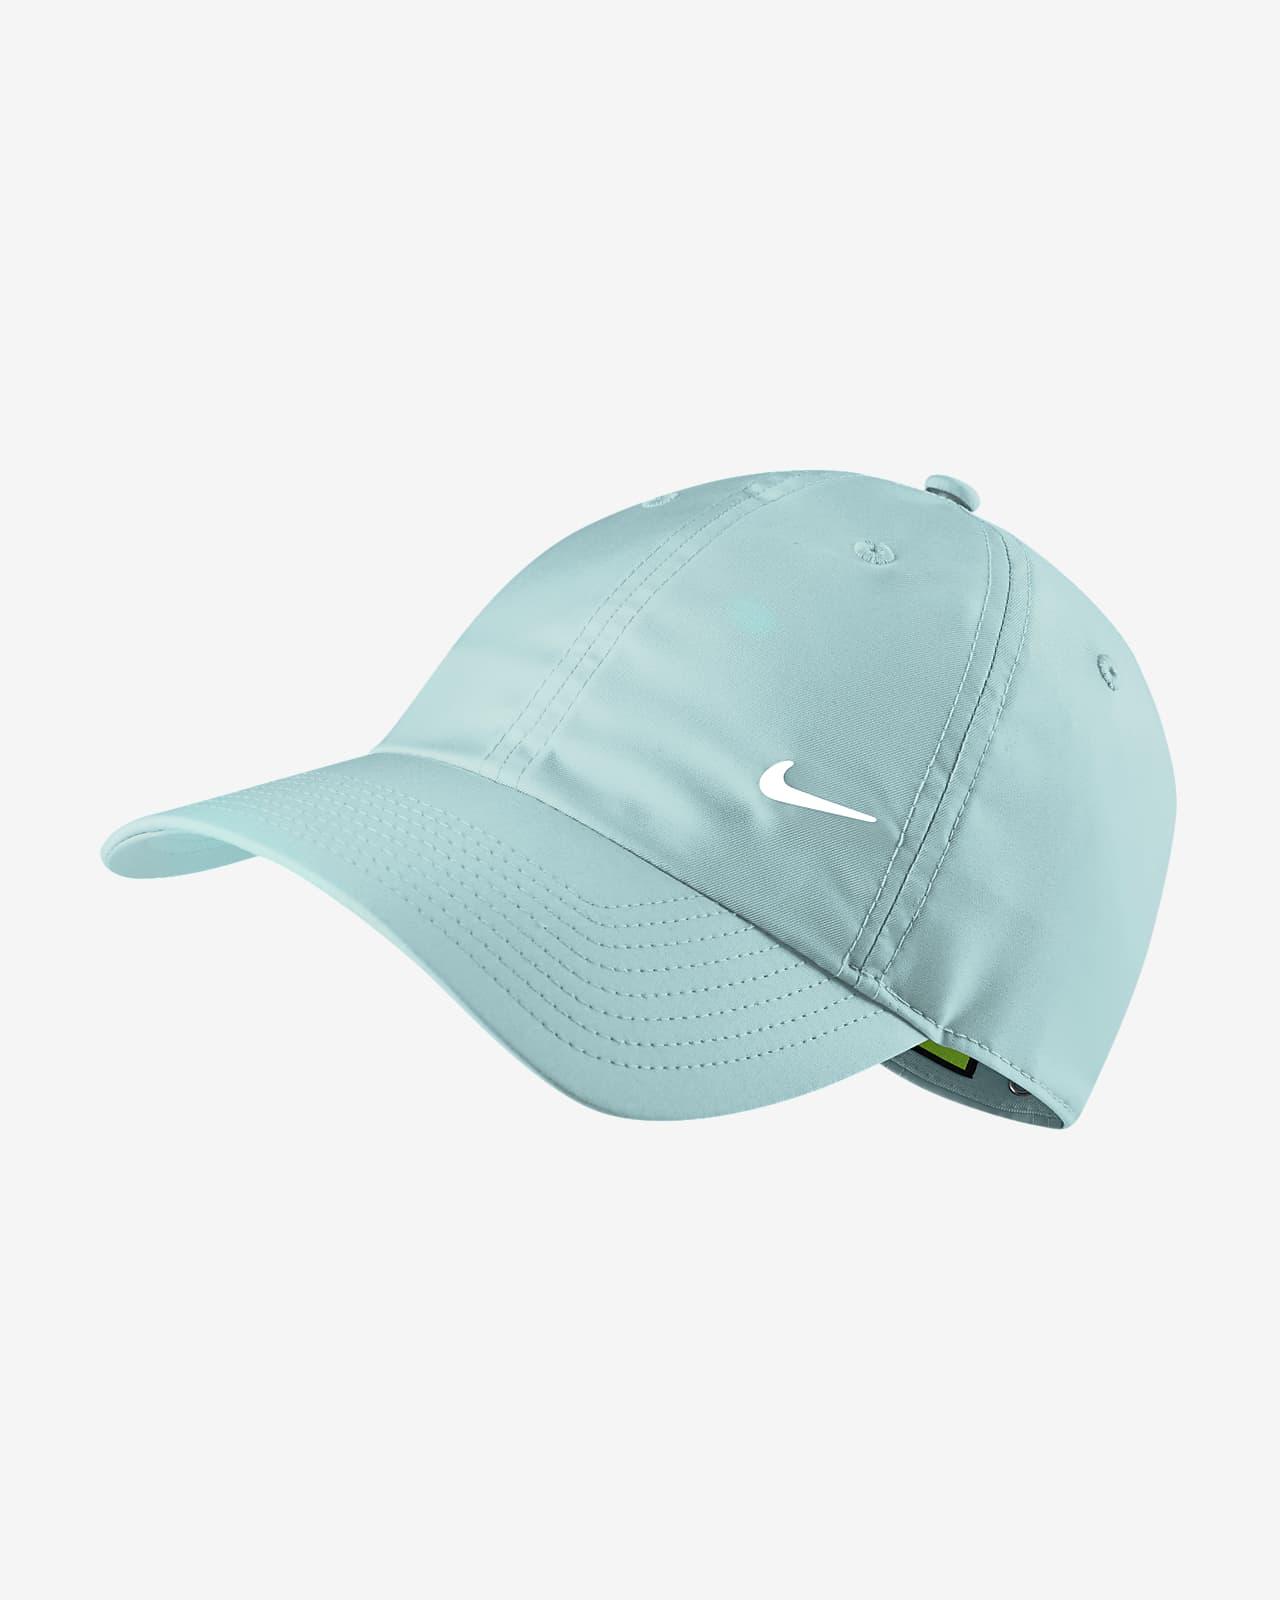 Nike Sportswear Heritage 86 帽款